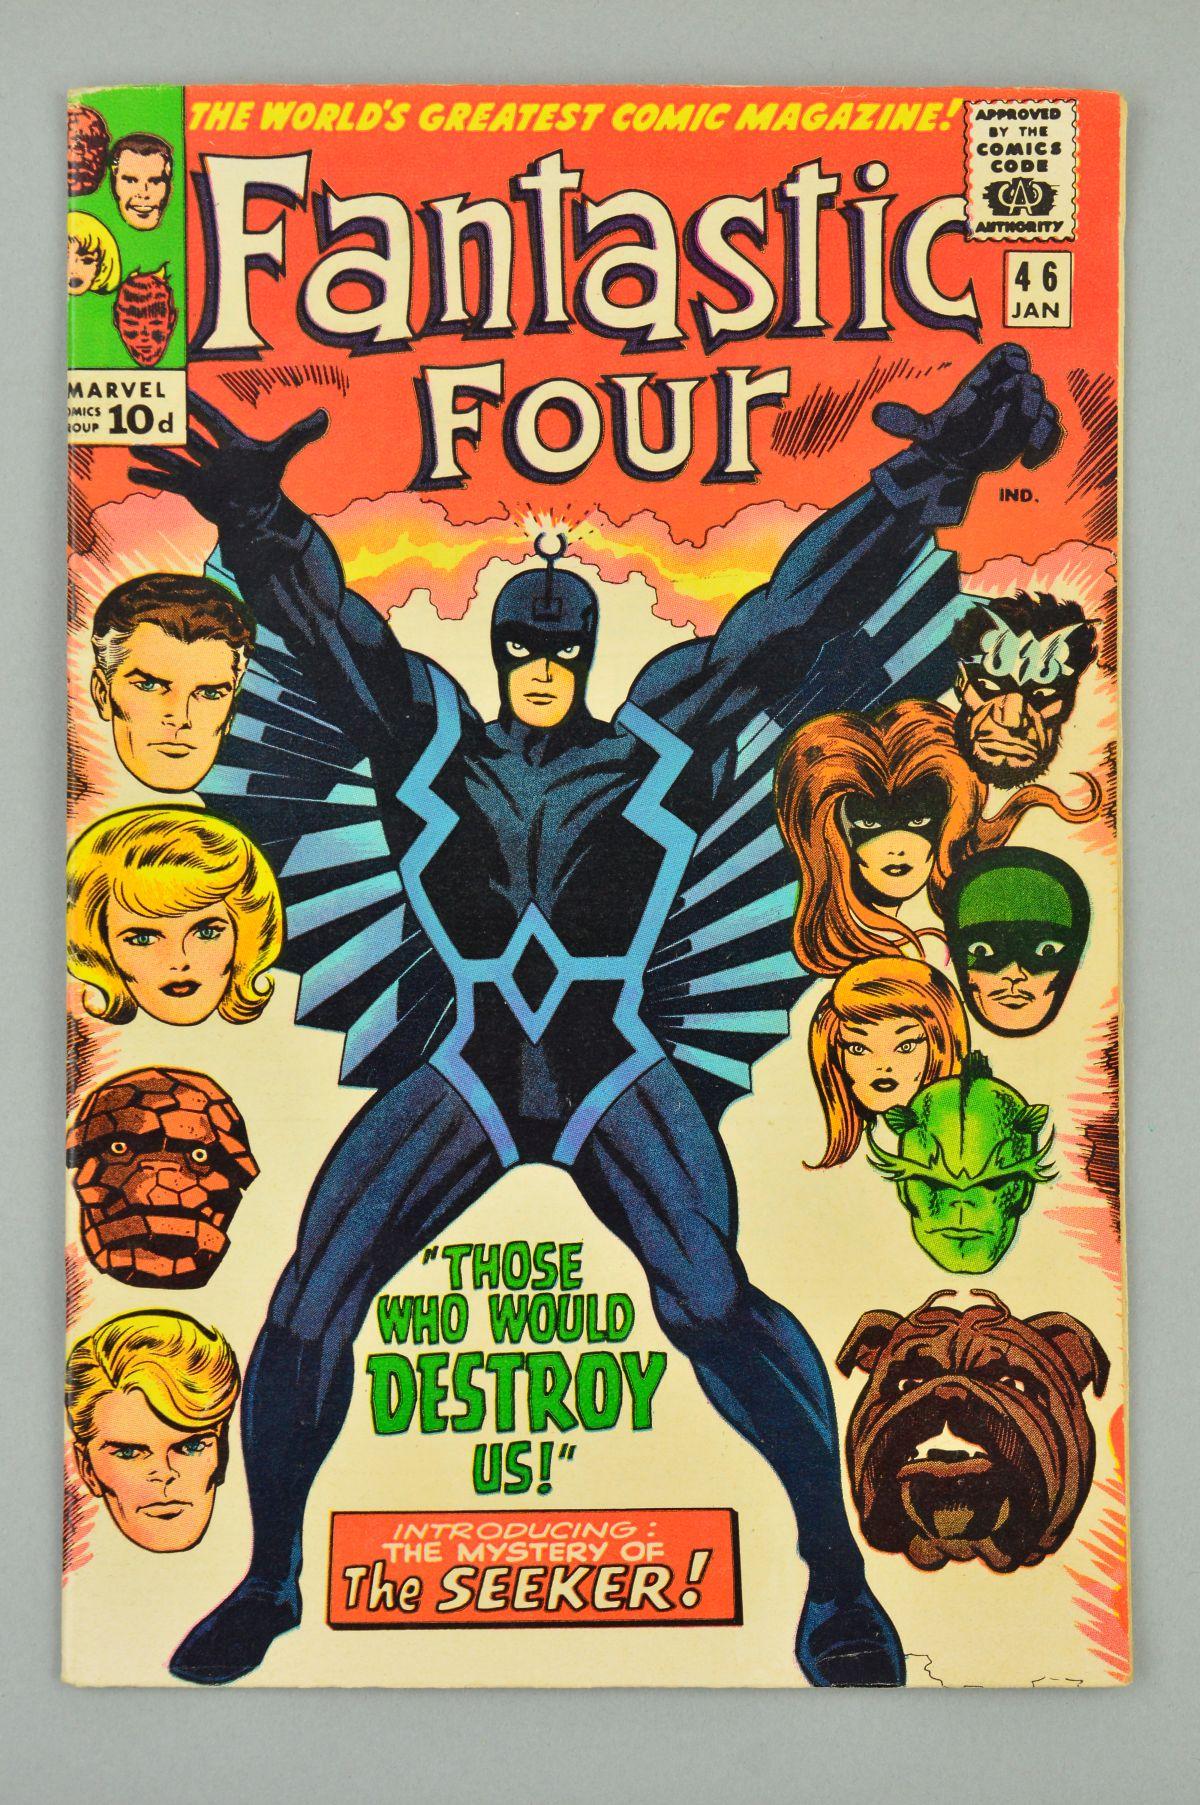 Lot 1845 - Fantastic Four (1961) #46, Published:January 10, 1966